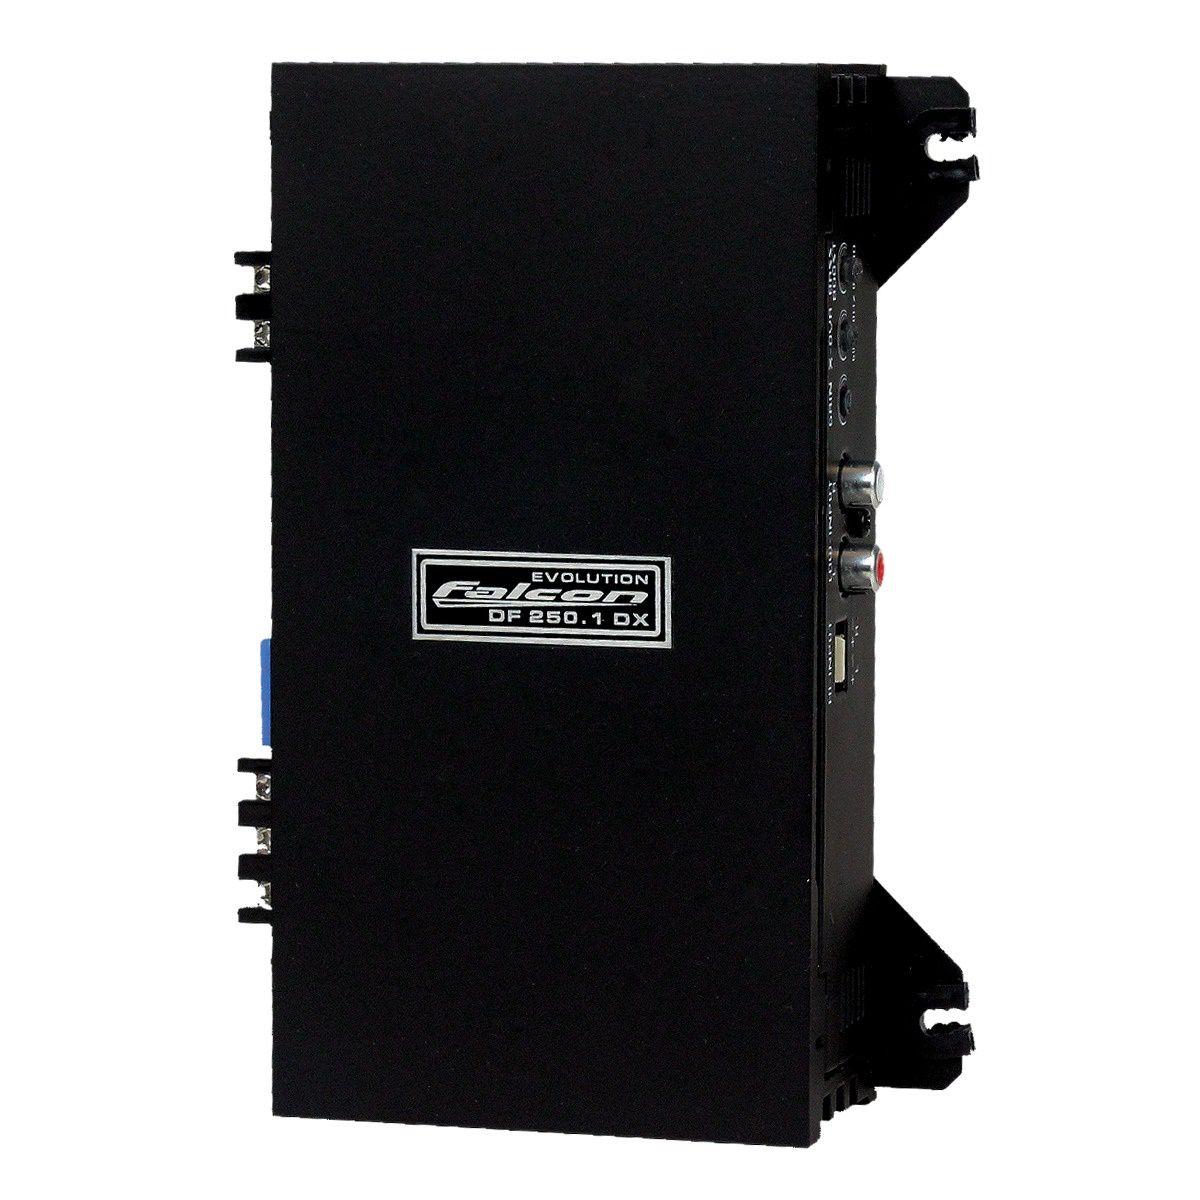 Módulo Amplificador Falcon DF250.1DX 250W Rms 2 Ohms 1 Canal Especifico para Subwoofer